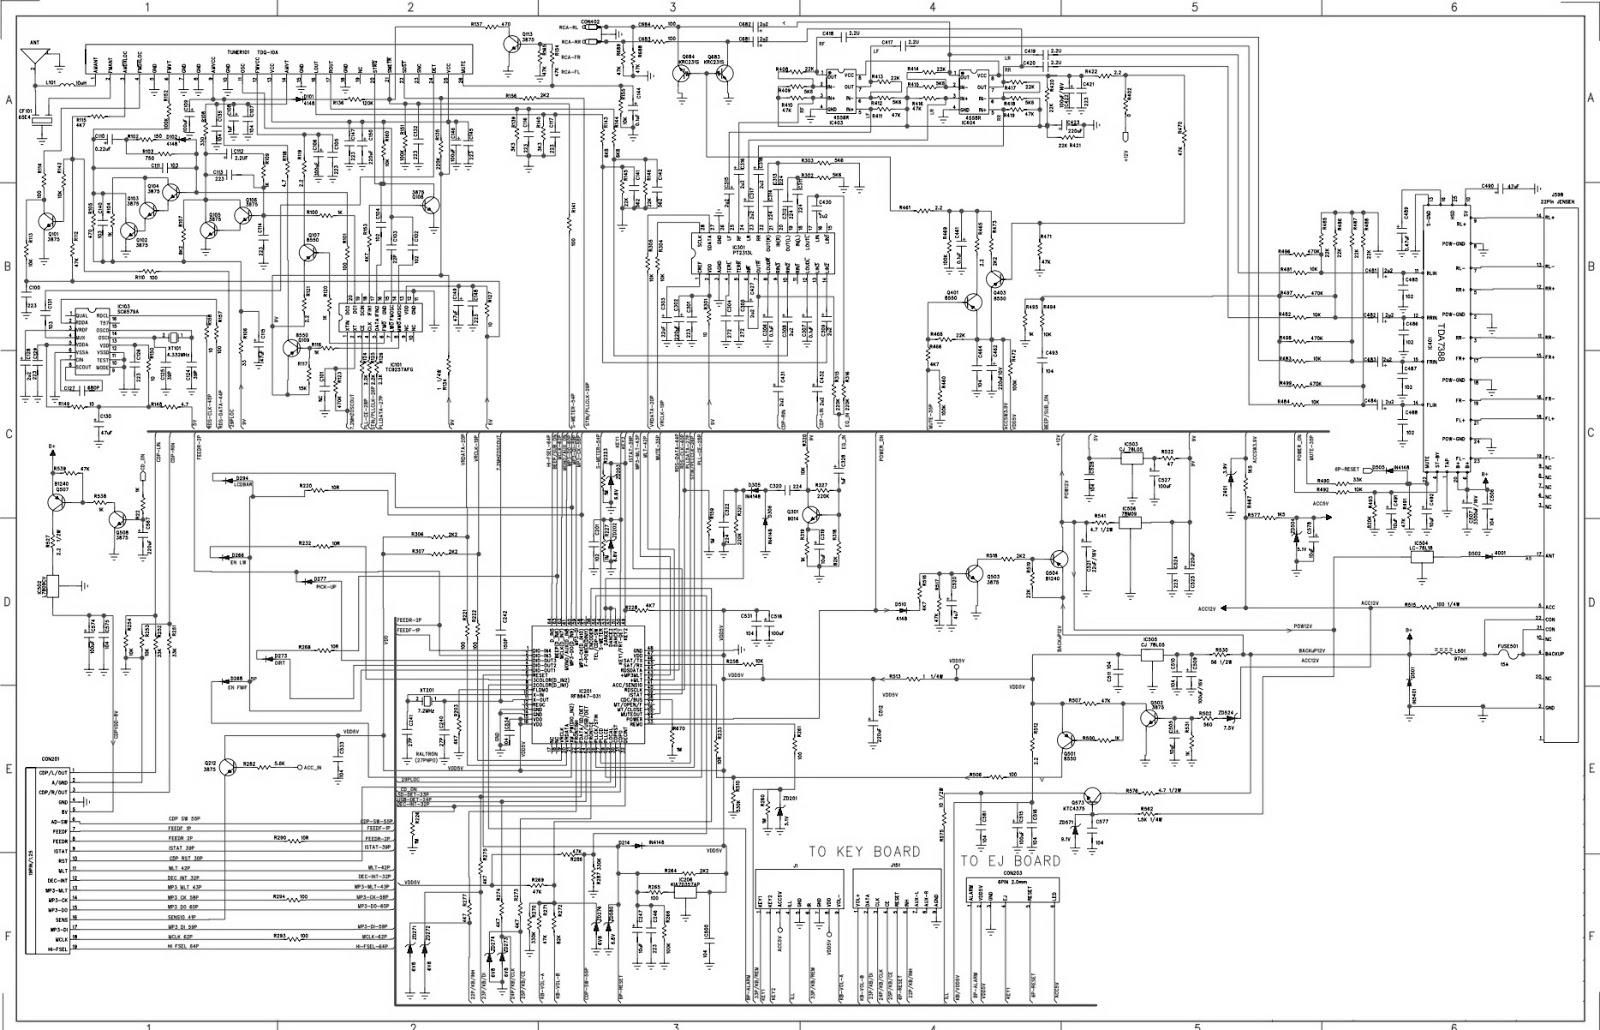 Electro help: Hyundai H CDM8042 Car Stereo Circuit Diagram